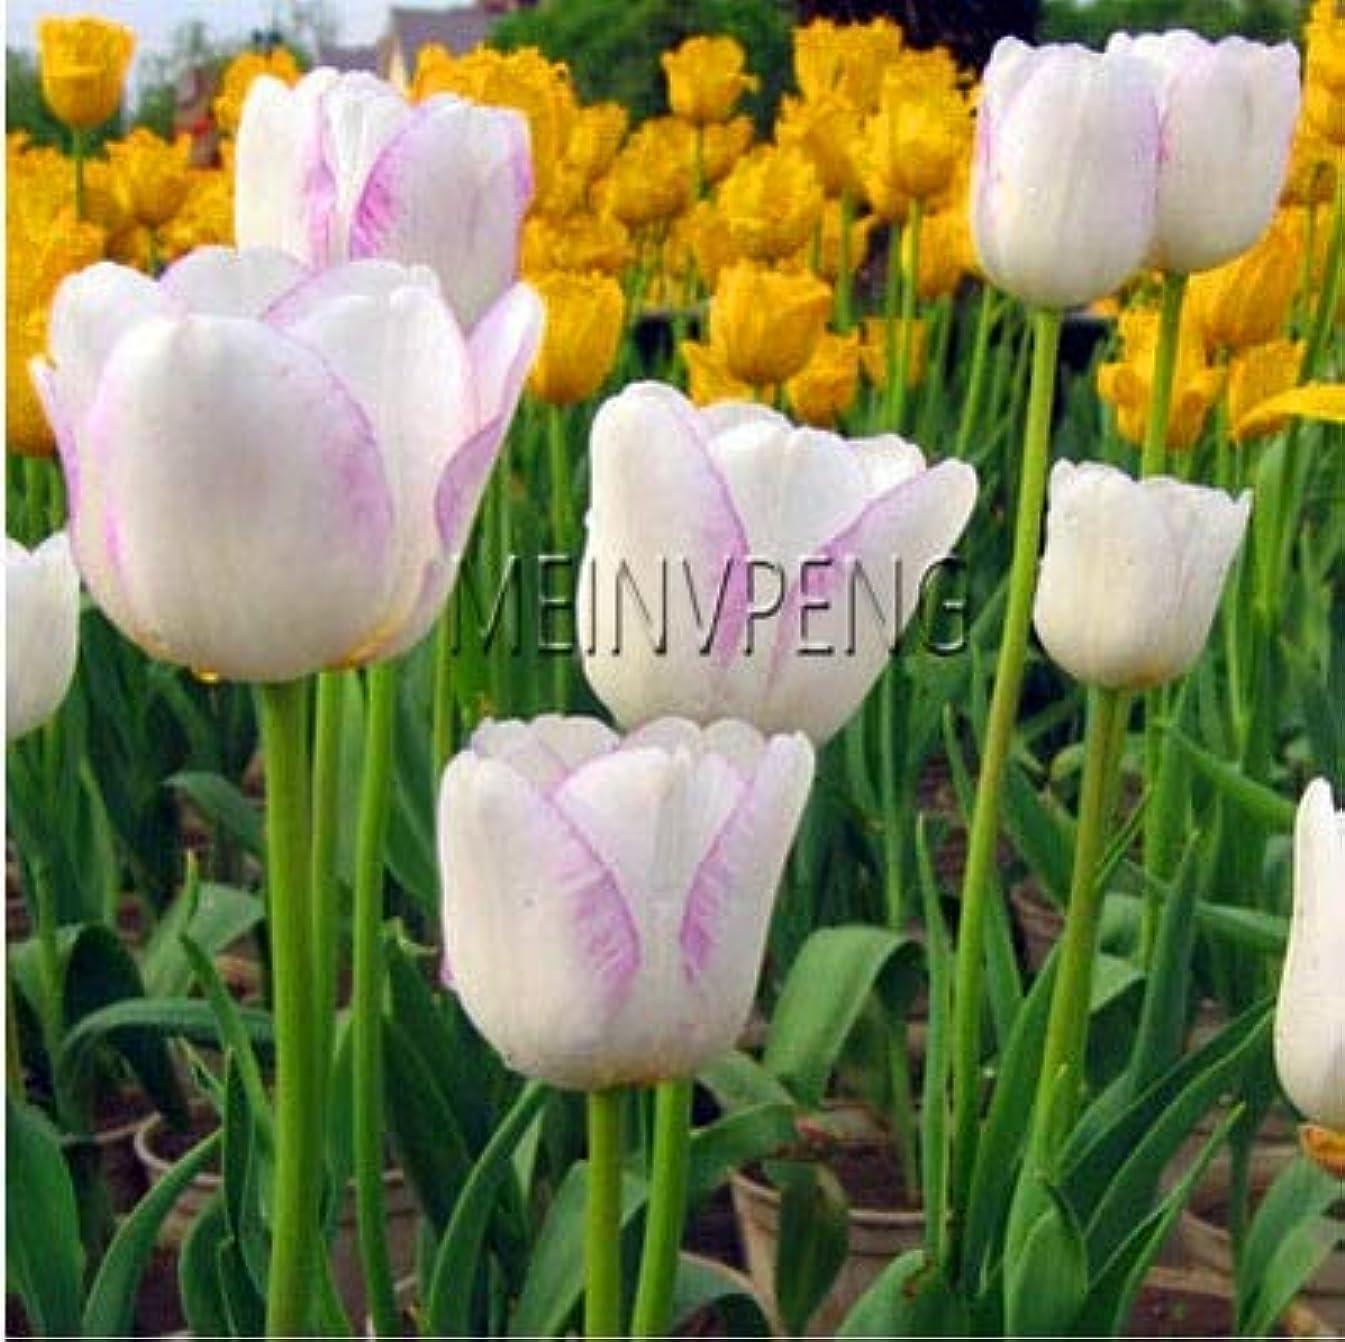 Casavidas Time-Limit!! Bonsai, Not Bulbs, Hydroponic Bonsai Flower Bonsai, Gard Tion Bonsai Flower,120flores: 16